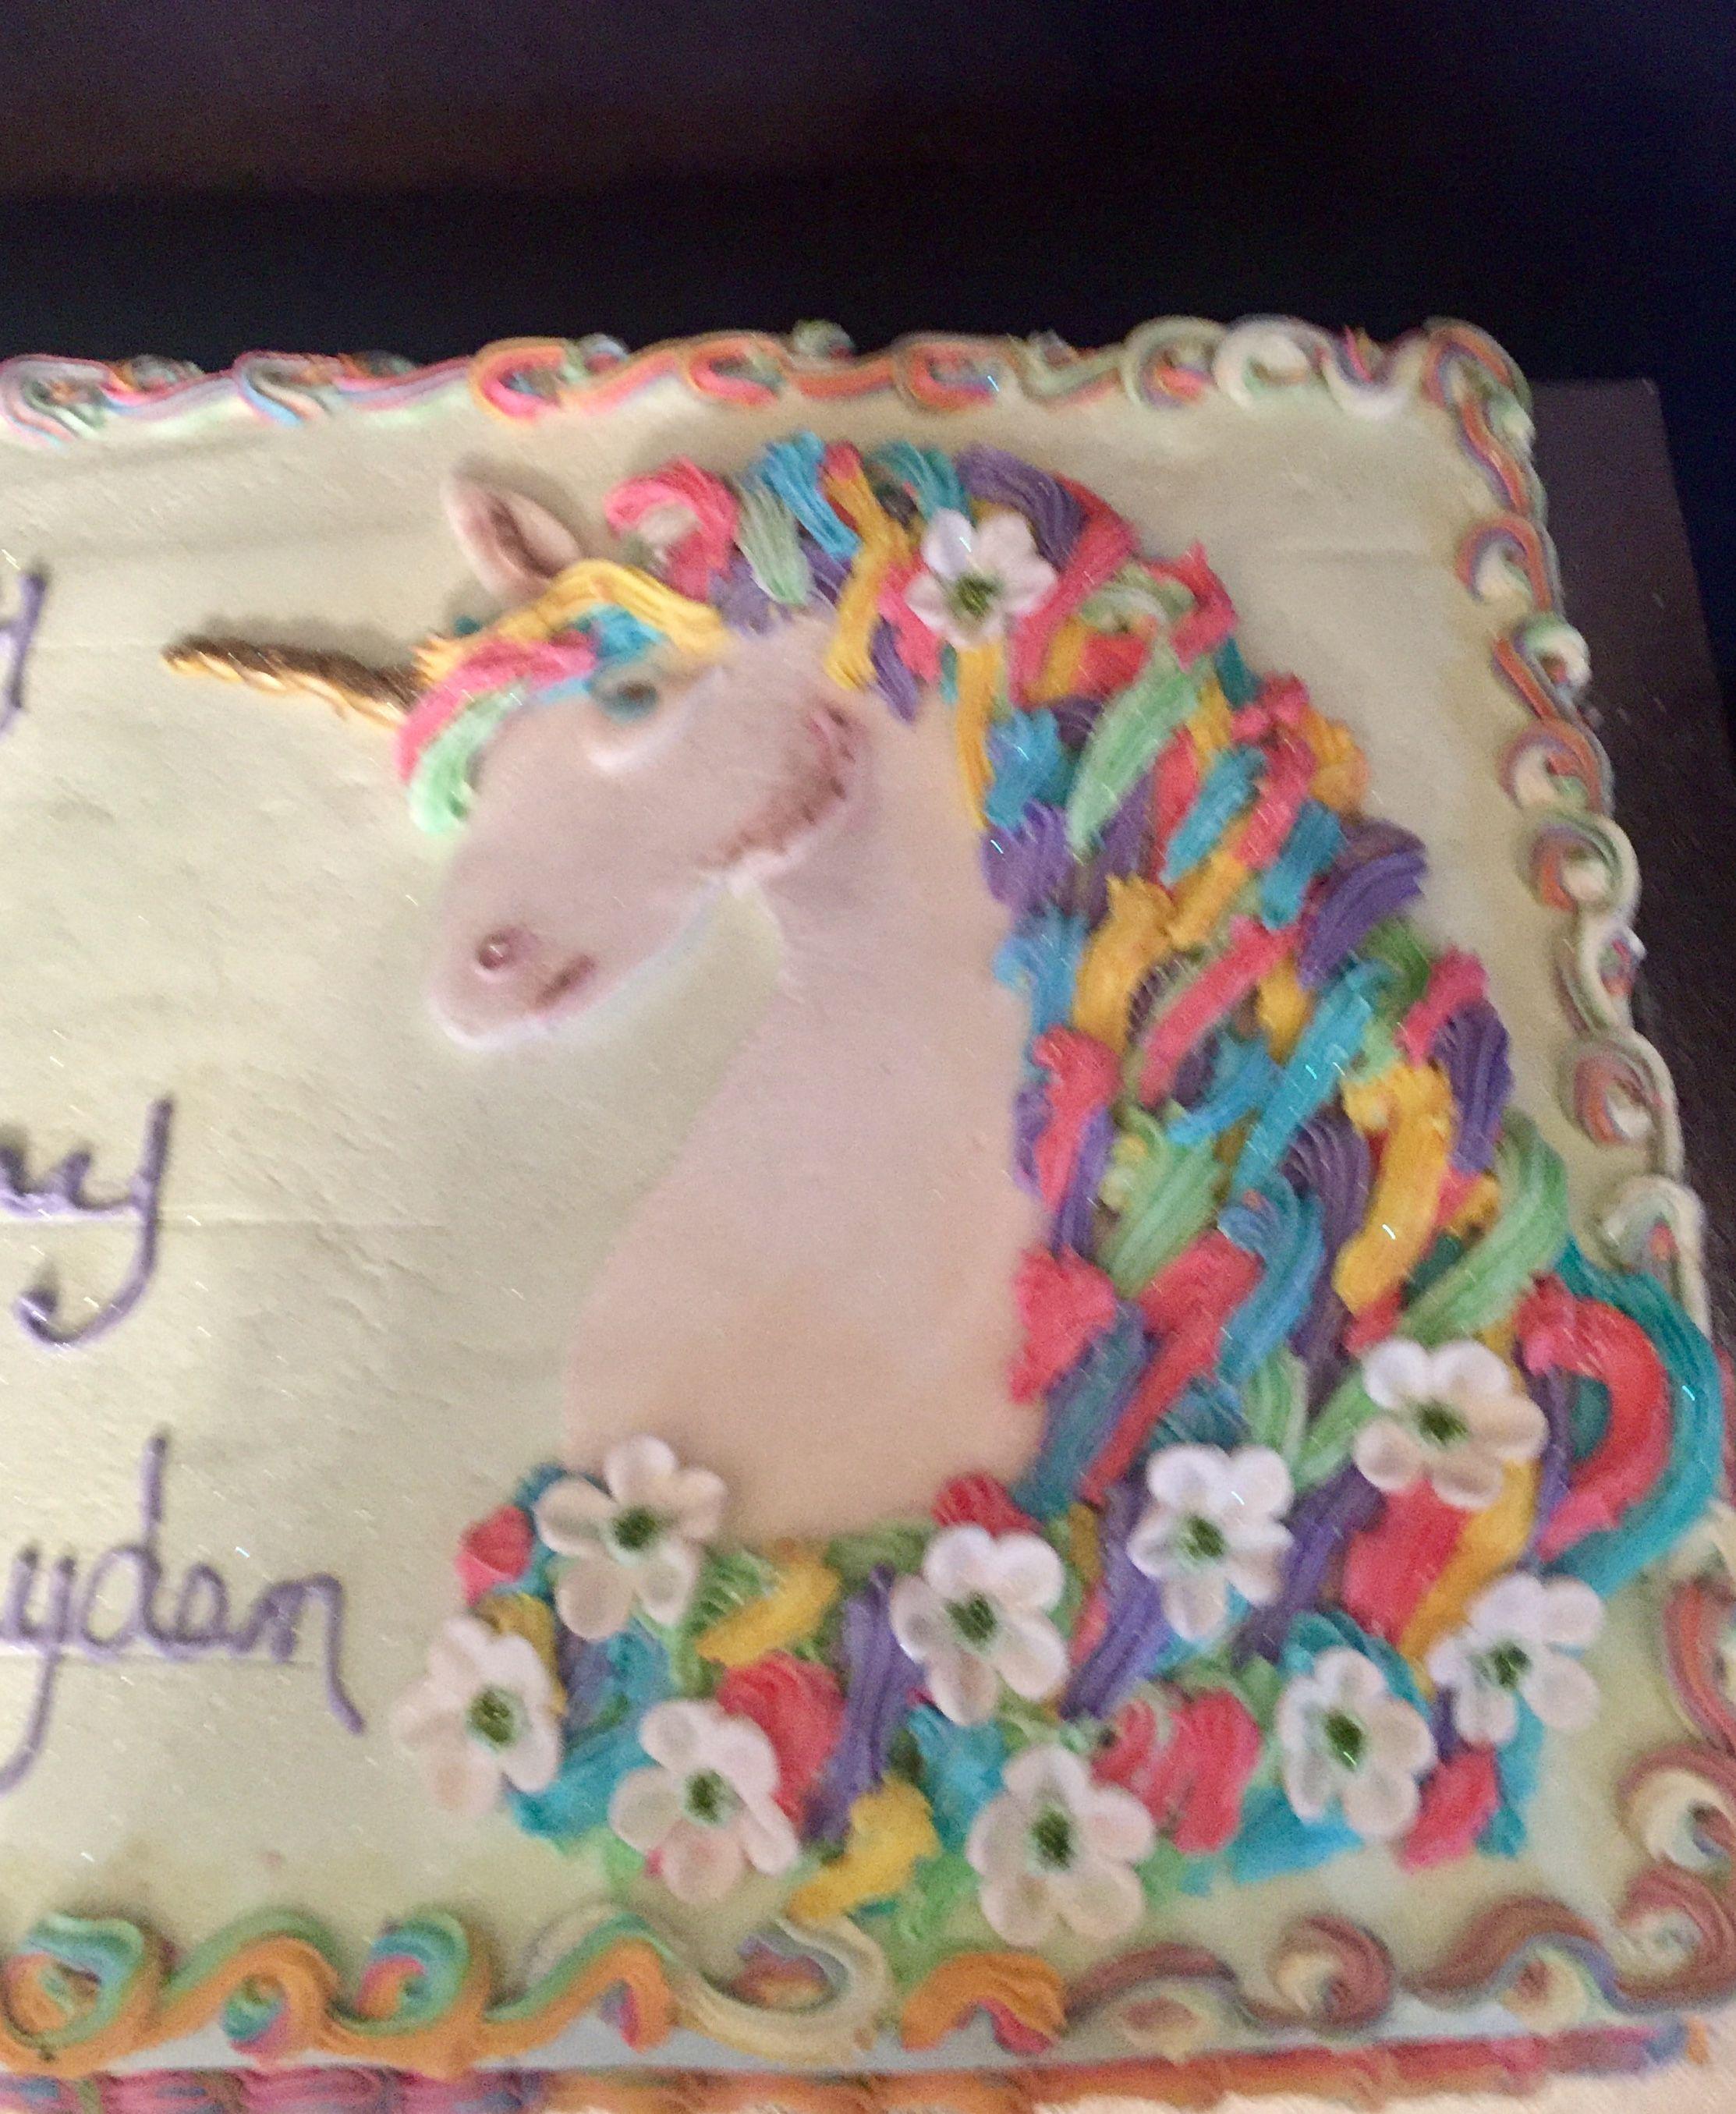 Unicorn 1 2 Sheet Birthday Cake Cake Art Design S By Marie Cake Cake Art Cake Designs